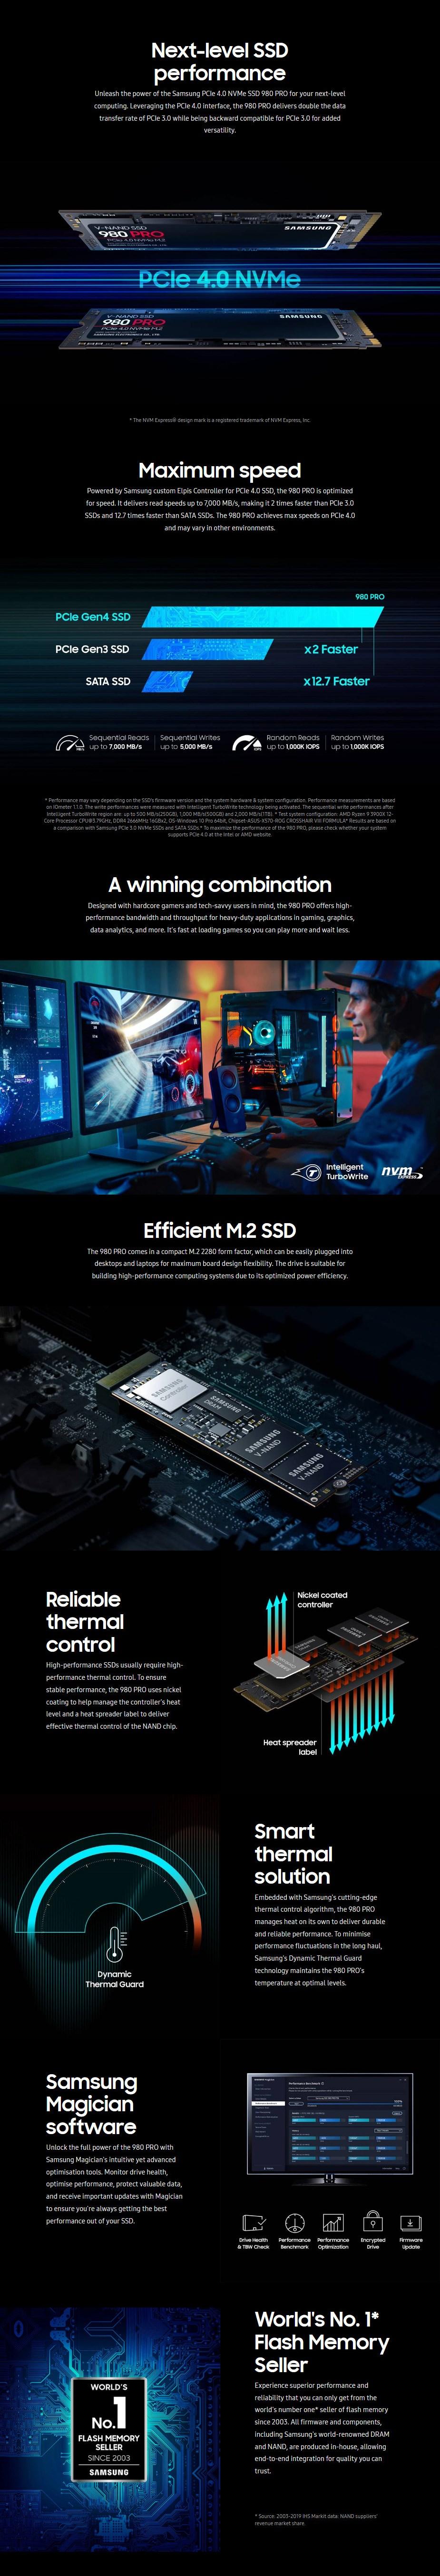 Samsung 980 Pro 500GB NVMe 1.3c M.2 (2280) V-NAND 3-Bit MLC SSD - MZ-V8P500BW - Overview 1